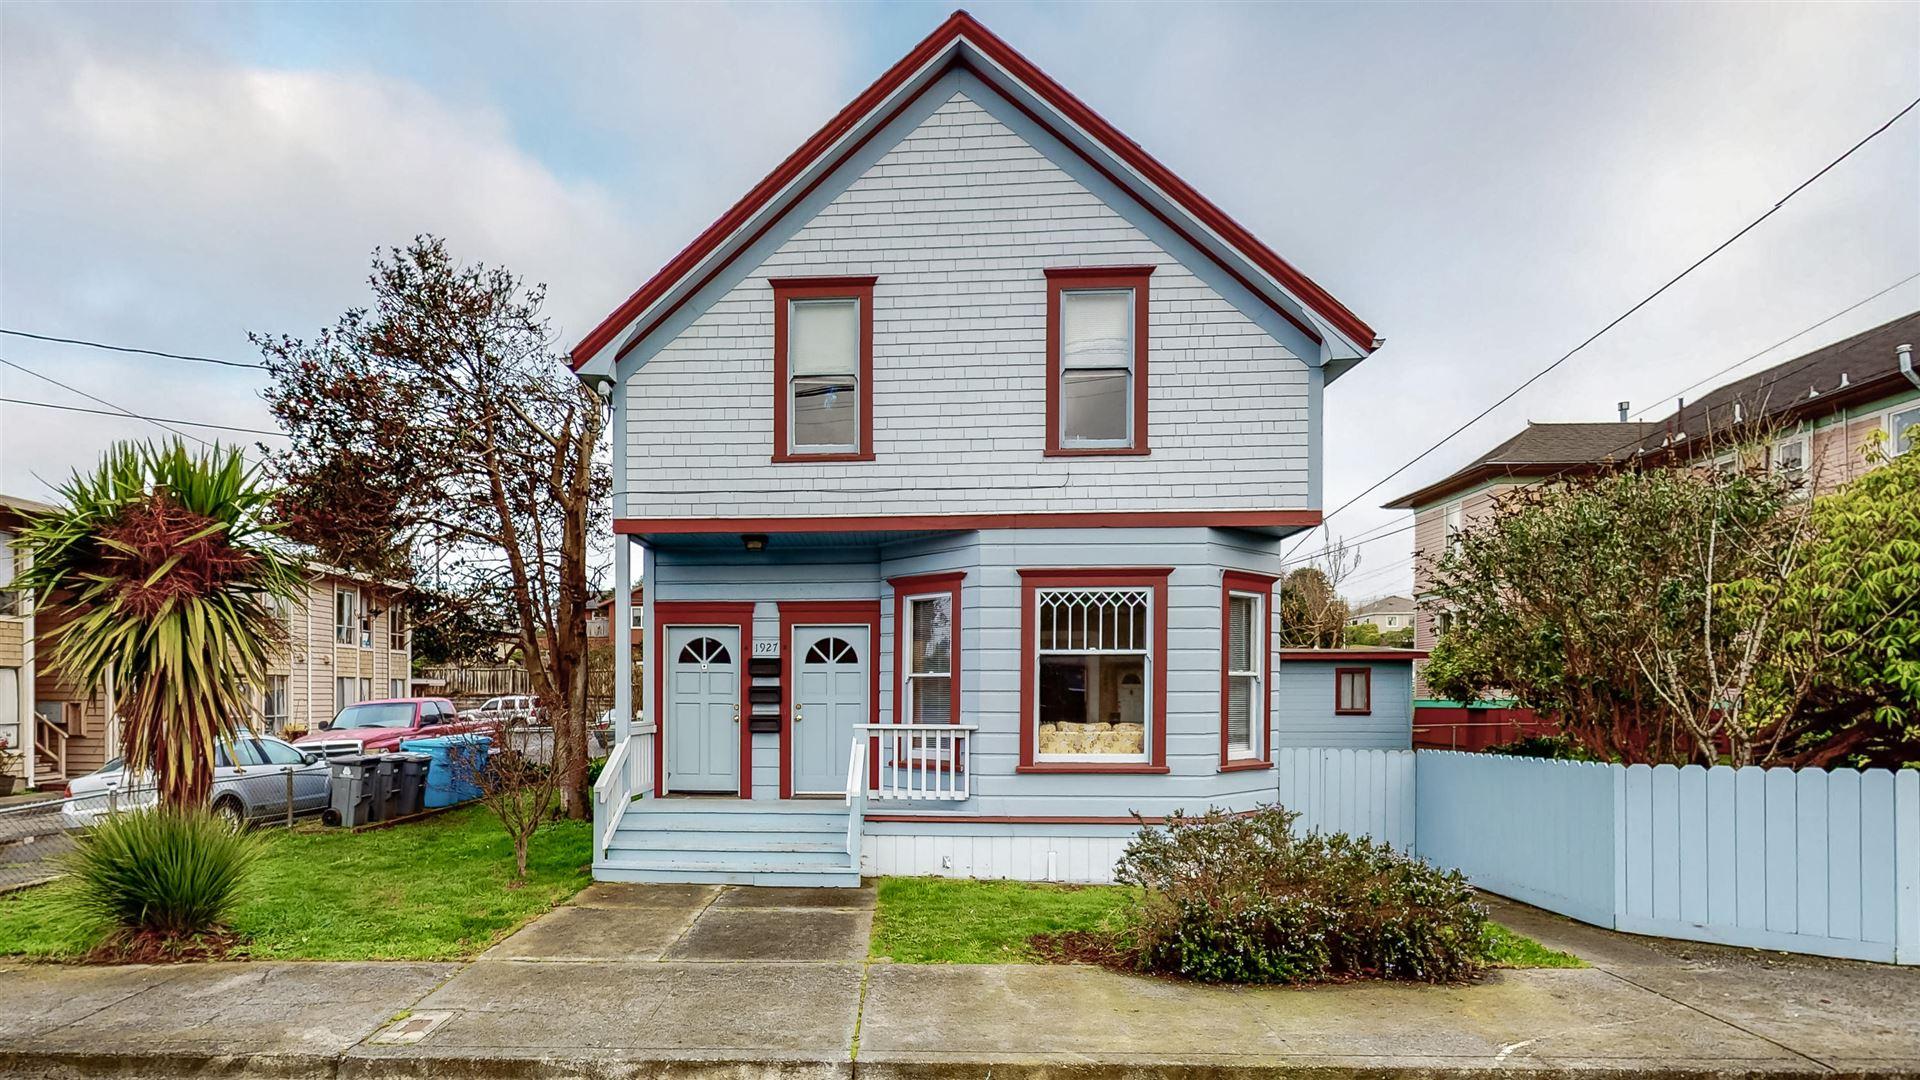 1927 C Street, Eureka, CA 95501 - MLS#: 258138